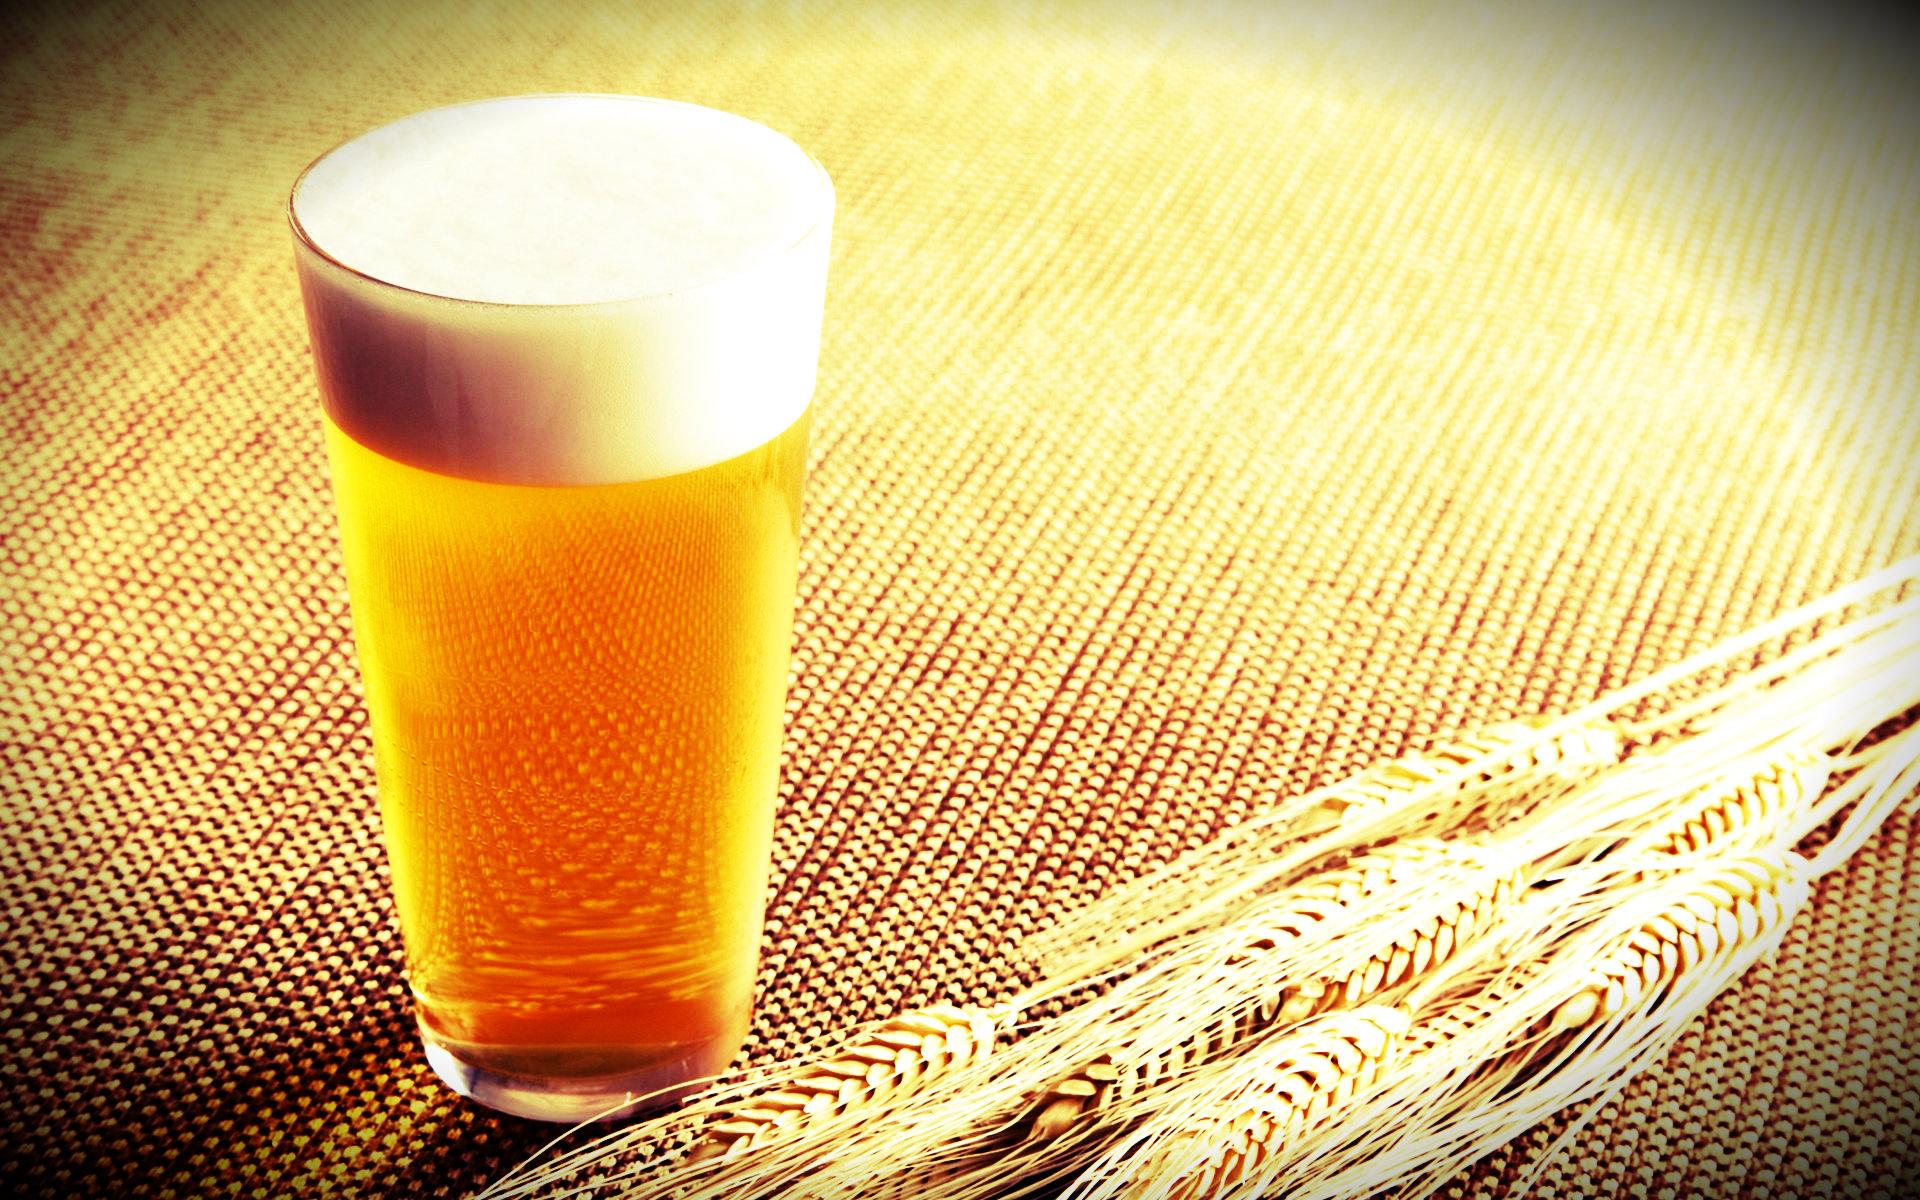 dia_da_cerveja_-_reproducao.jpg